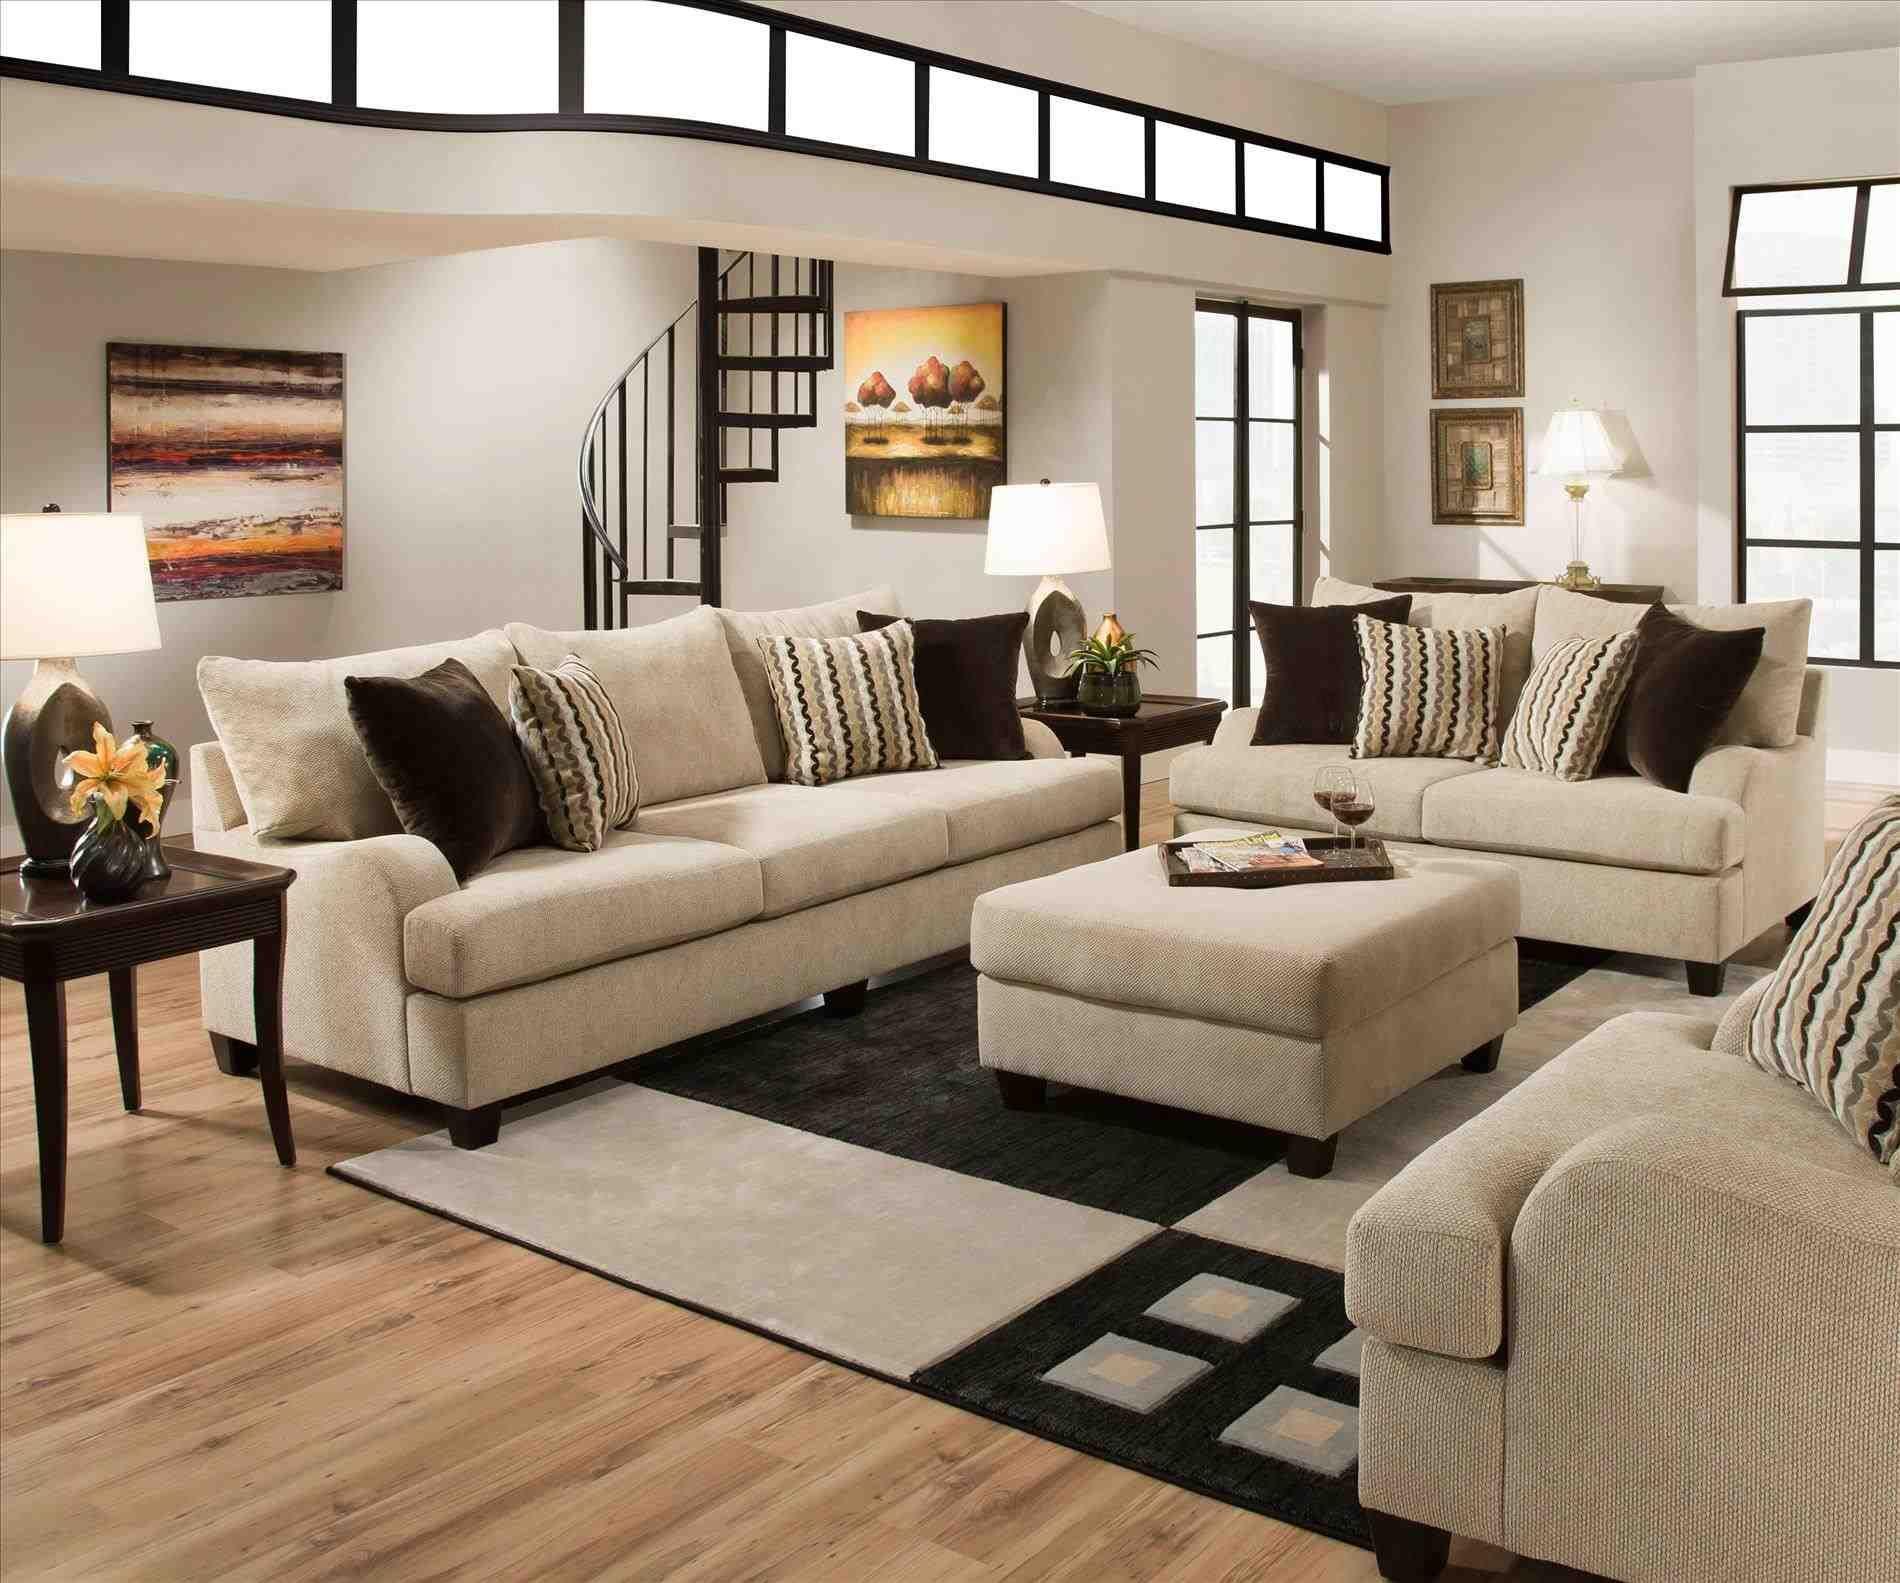 cheap living room suites dark grey carpet white walls furniture ideas nice simple wooden sofa for wood trim pine inexpensive design